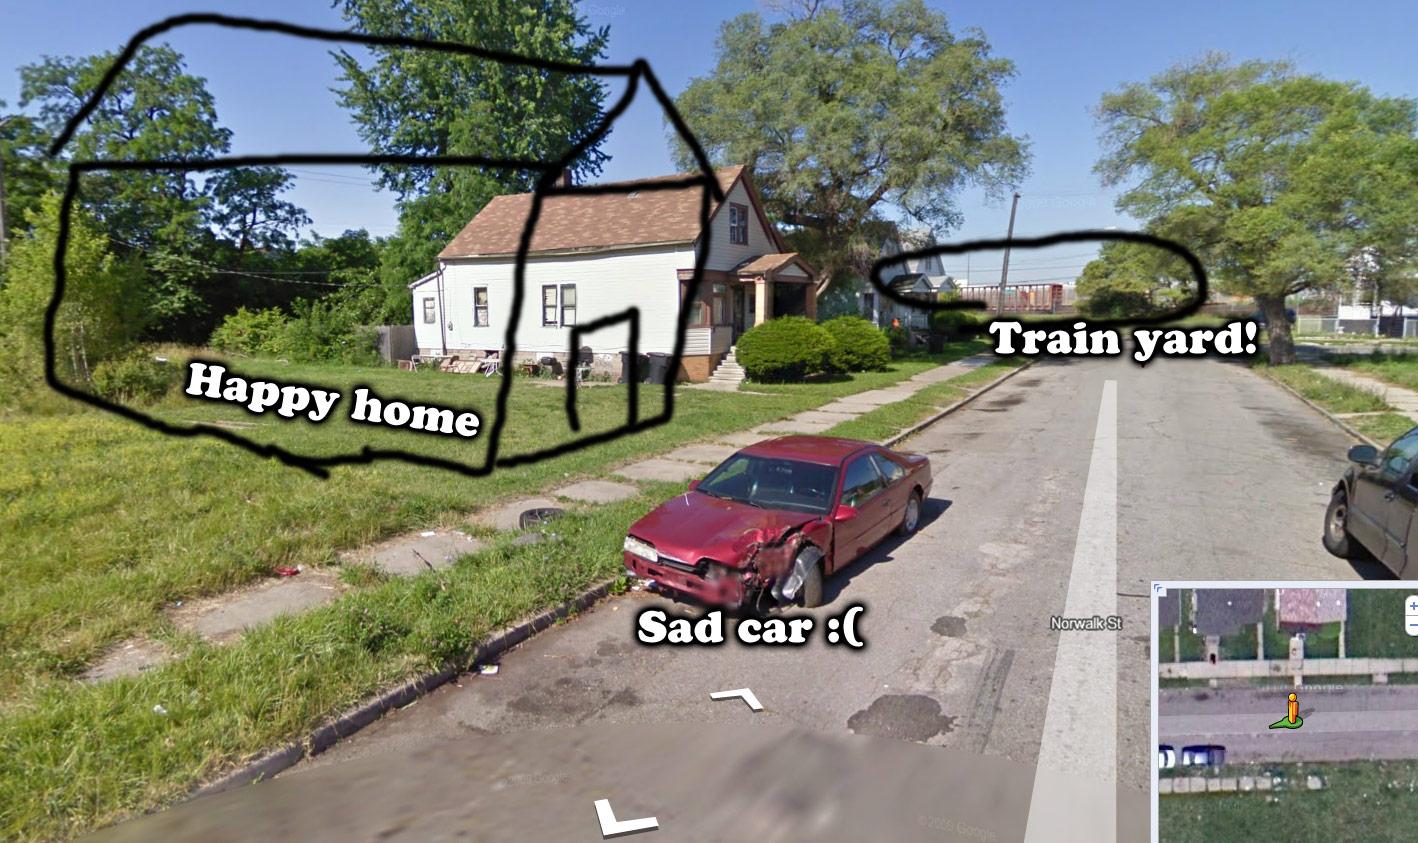 My original home in Detroit, Michigan